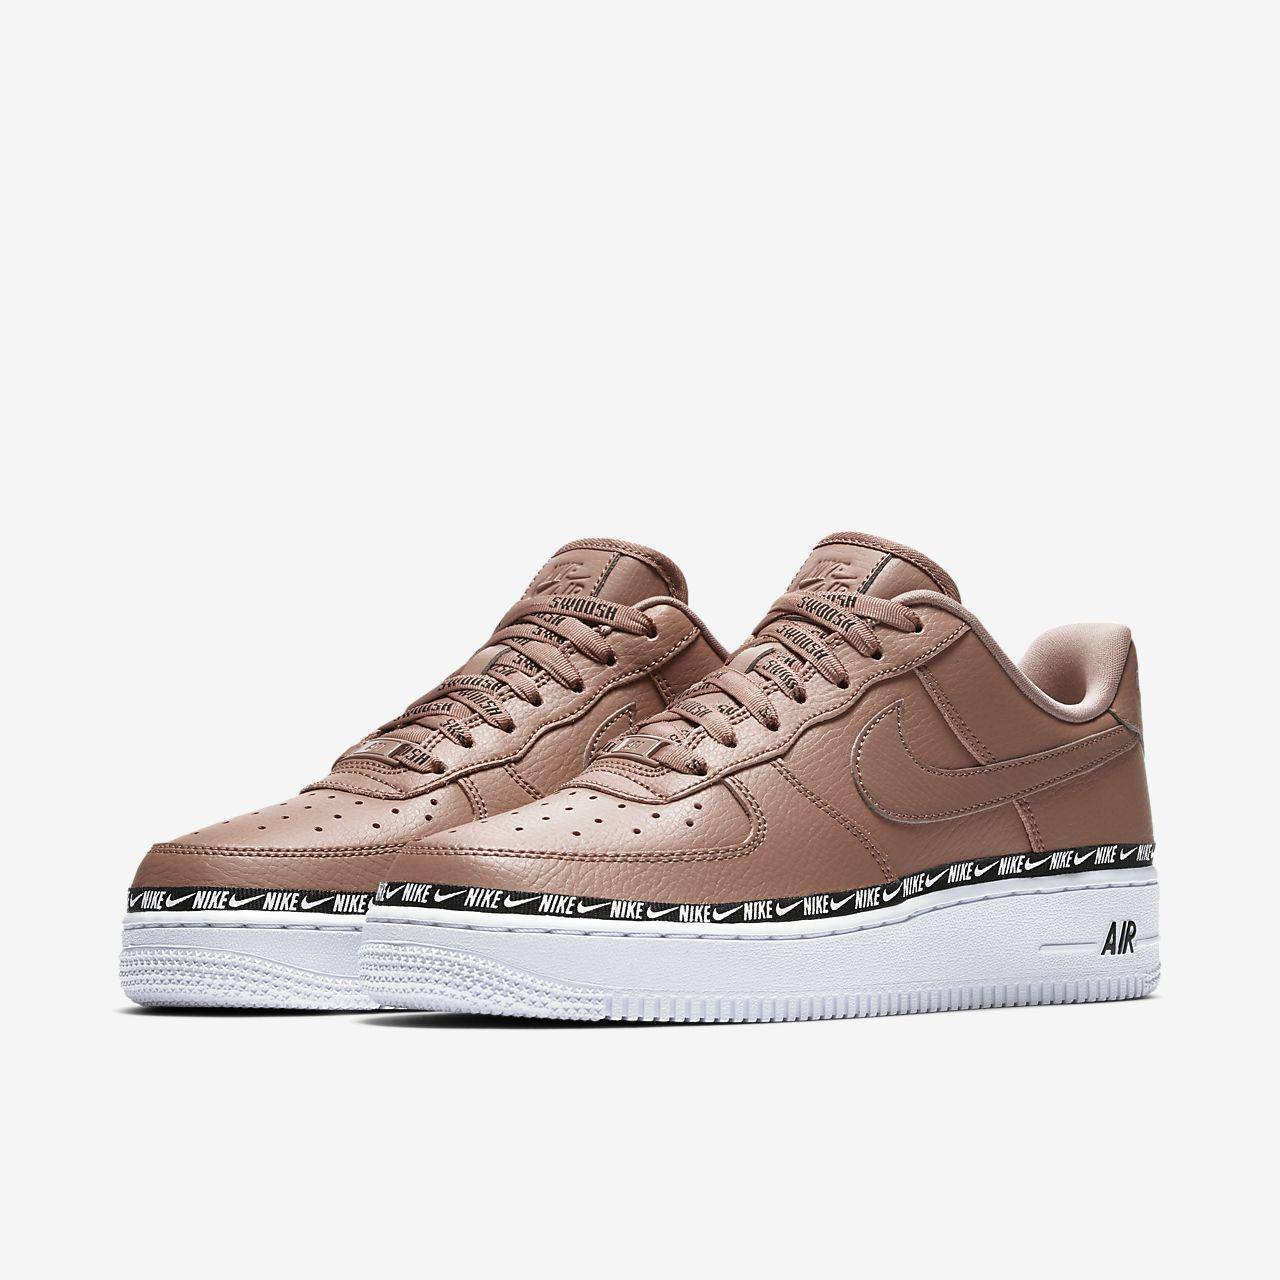 a4478b96d36 Nike Air Force 1  07 SE Premium Women s Shoe. Nike.com SG